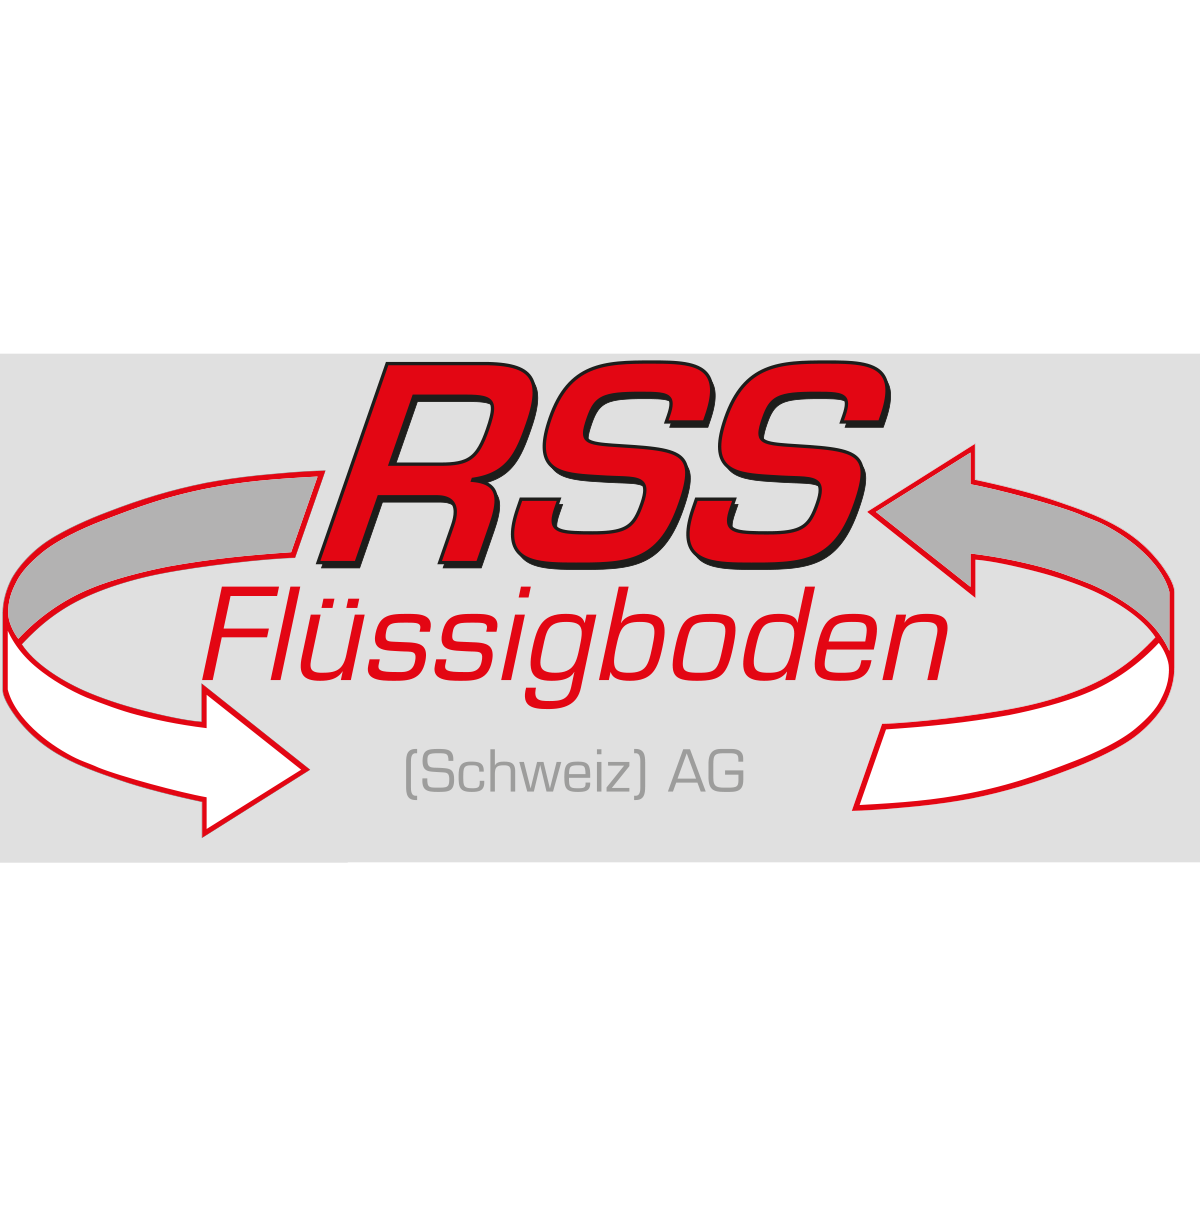 RSS Flüssigboden (Schweiz) AG